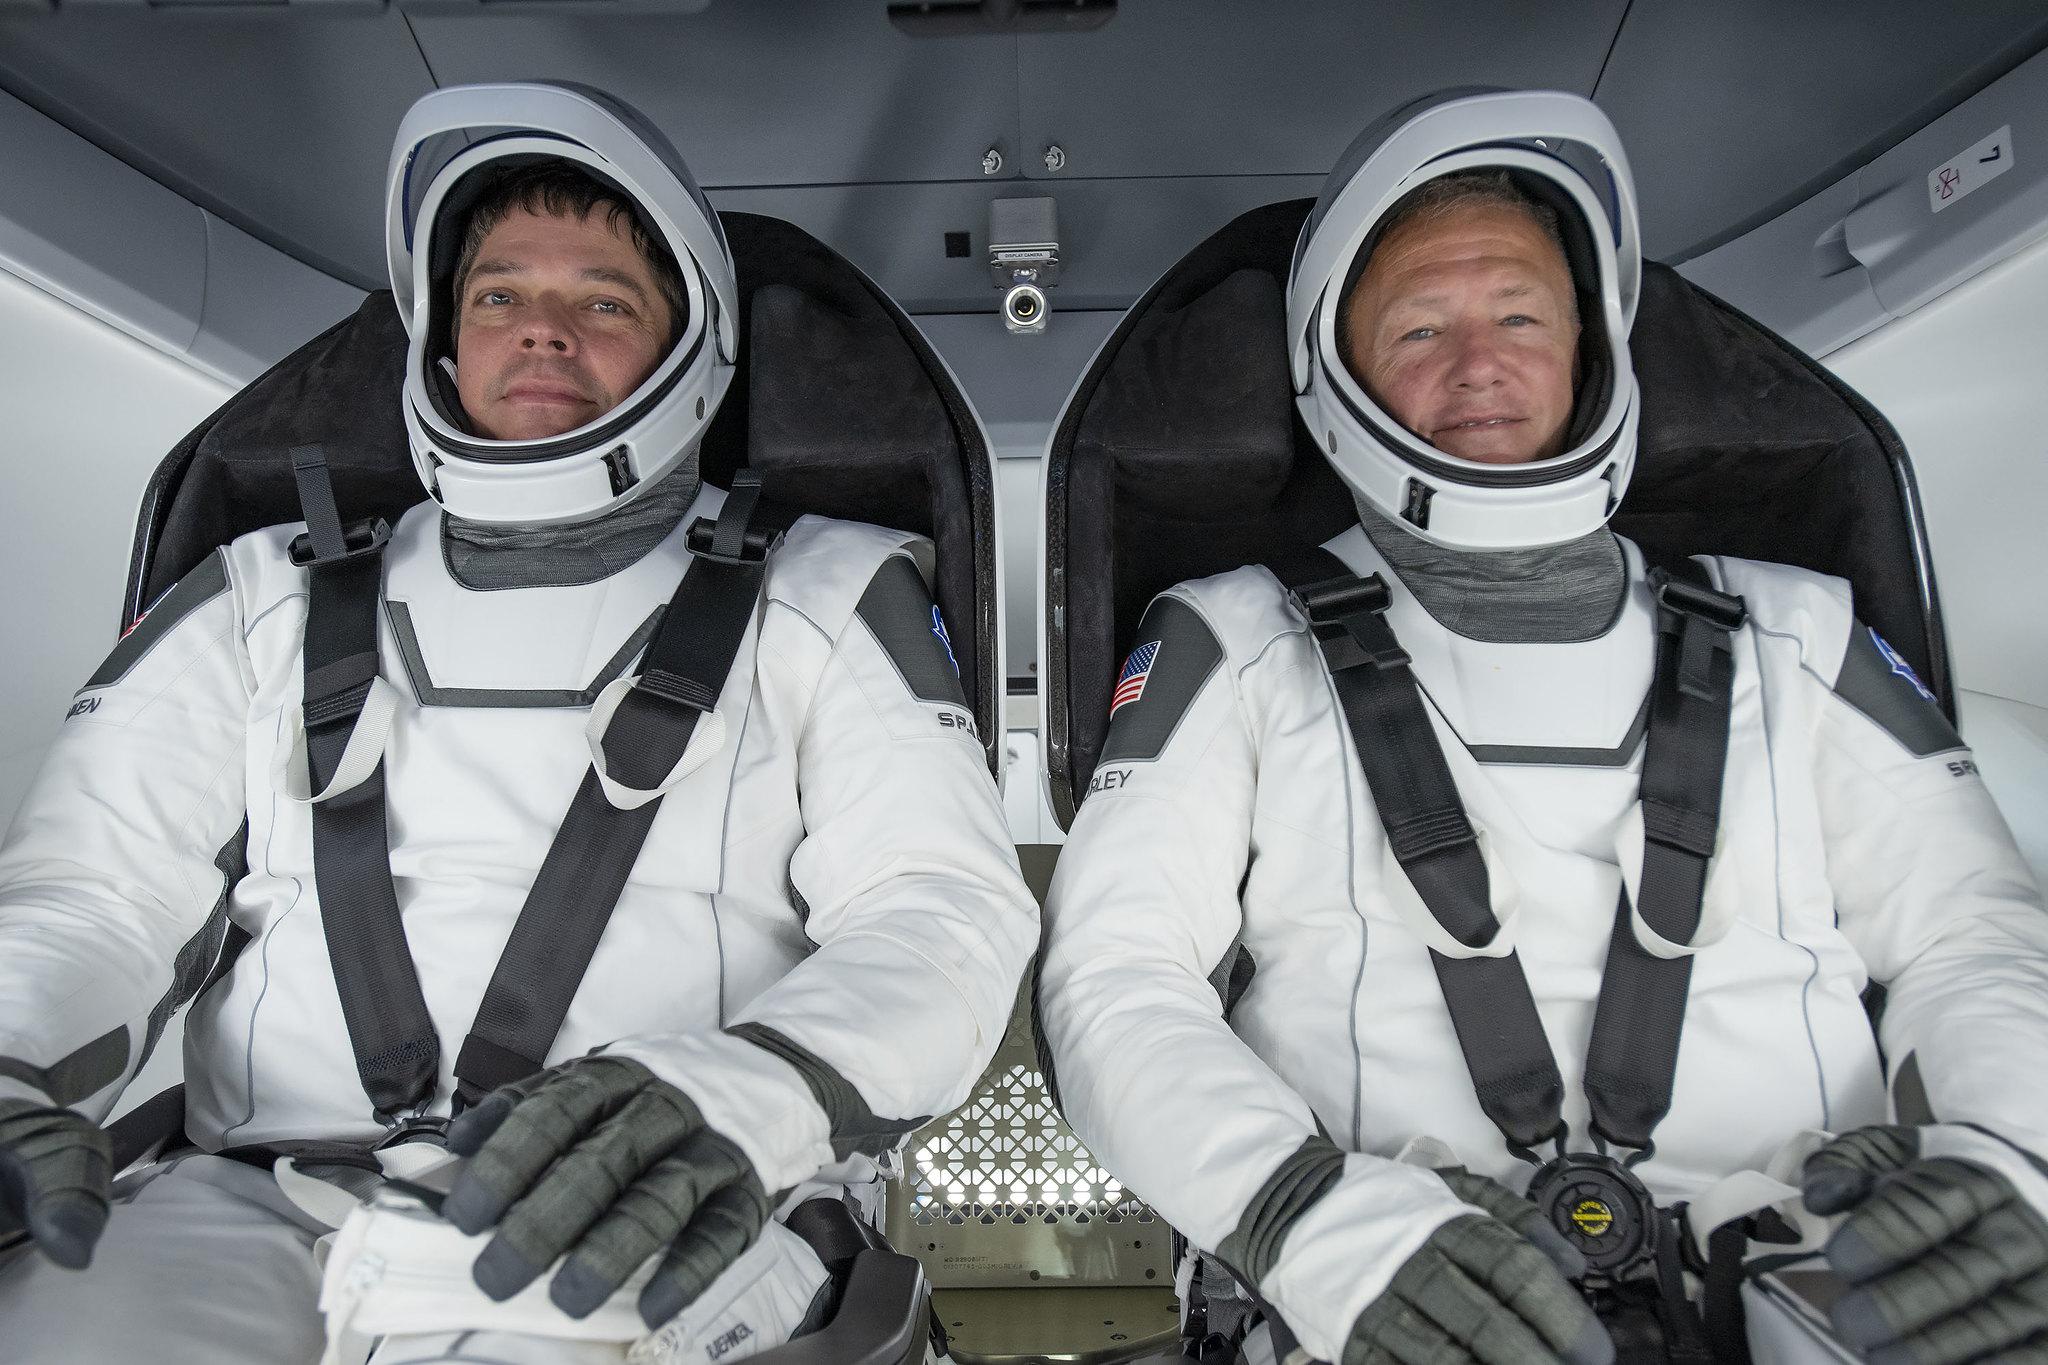 NASA astronauts Robert Behnken, left, and Douglas Hurley participated in mission Demo-2. Photo credit: SpaceX